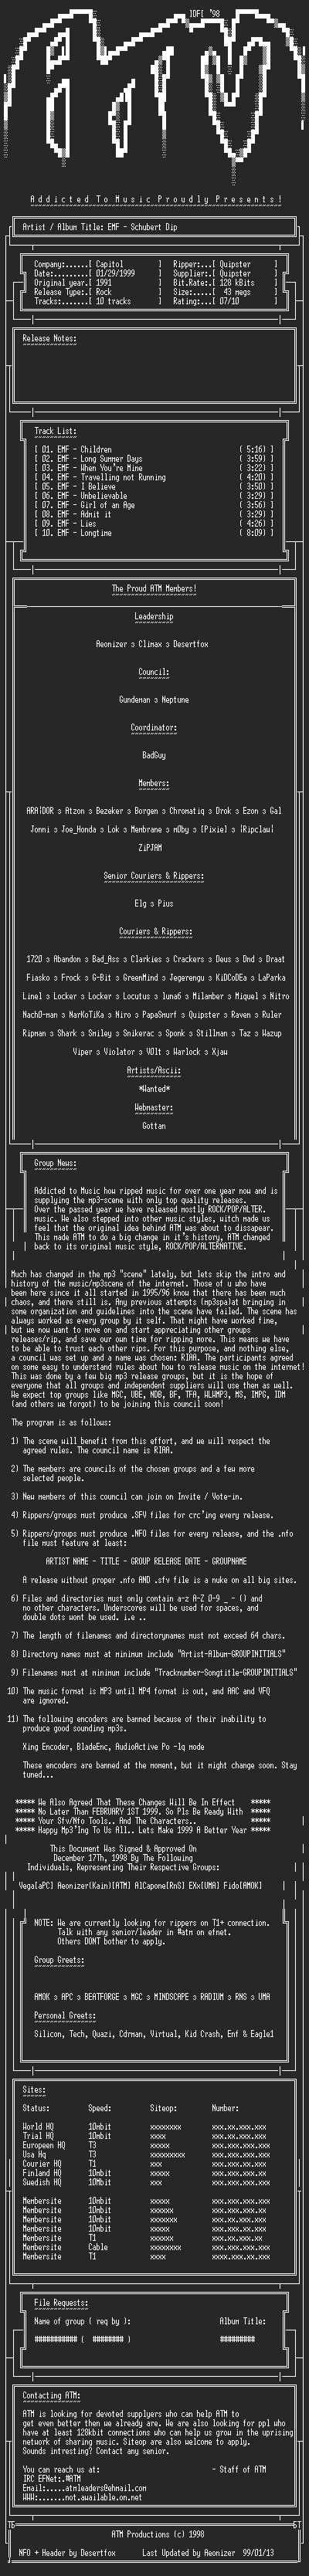 NFO file for EMF_-_Schubert_Dip_-_1991-ATM